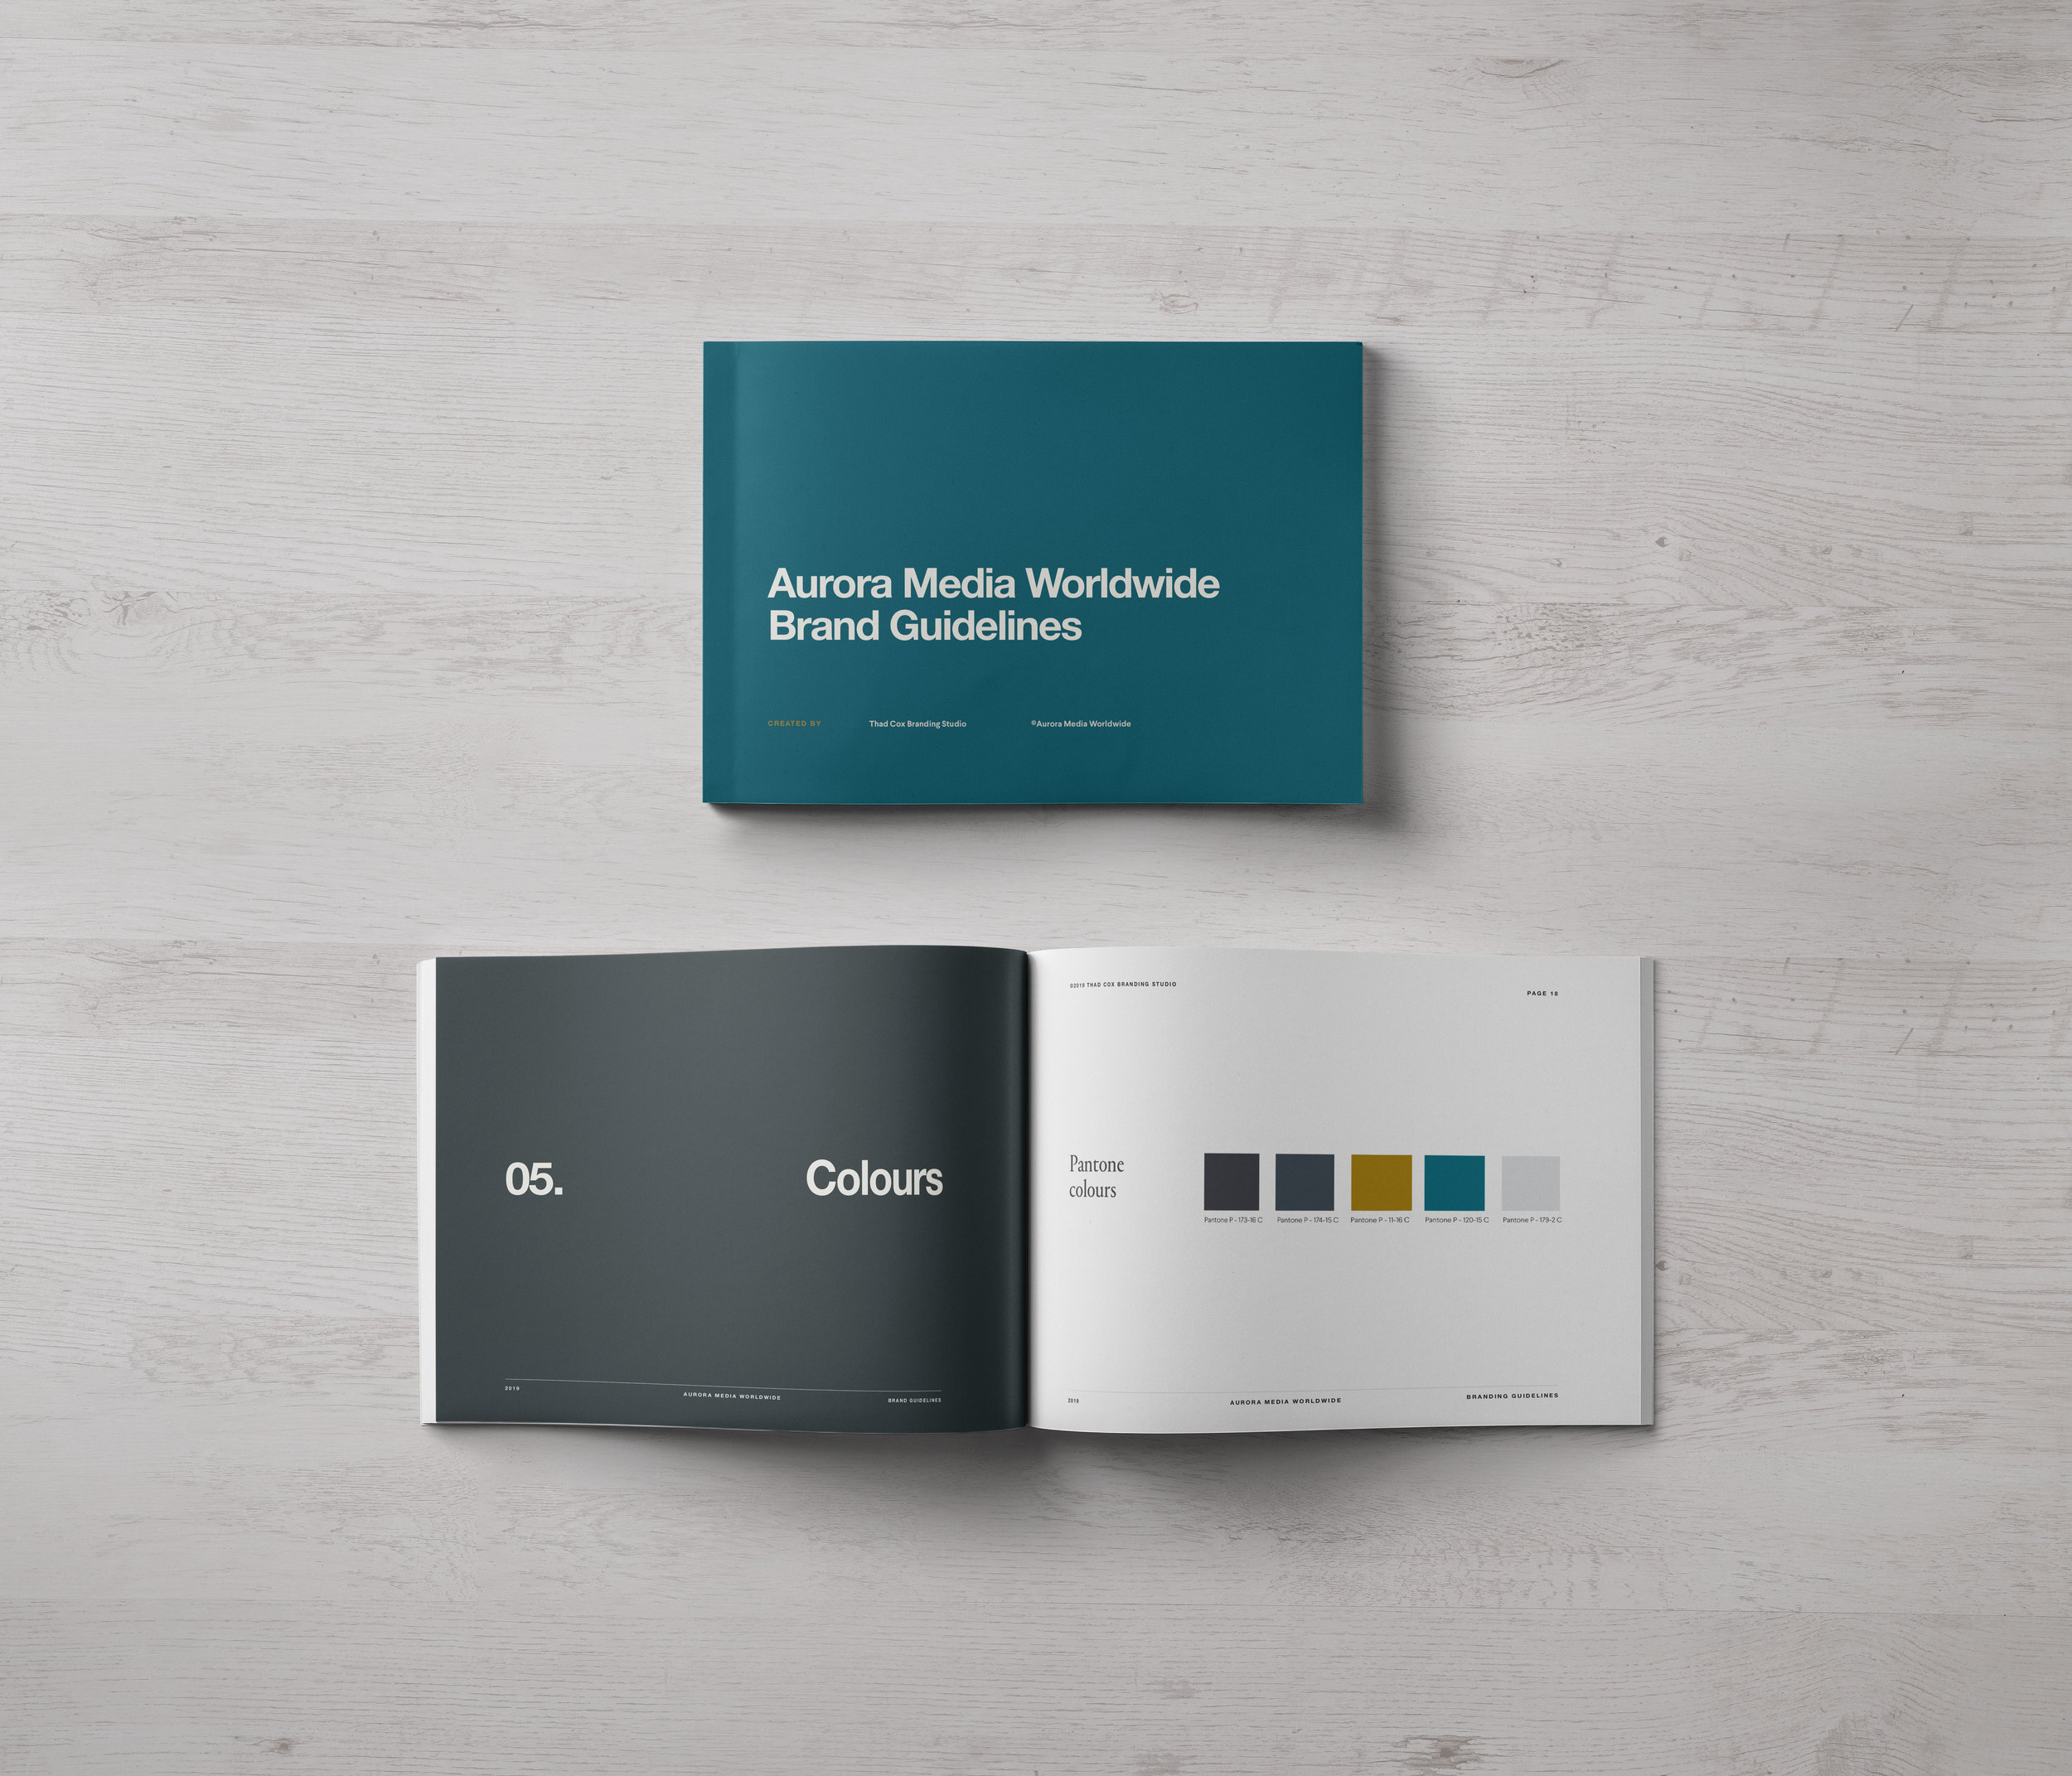 Aurora-Brand-Guidelines-MockUp2.jpg